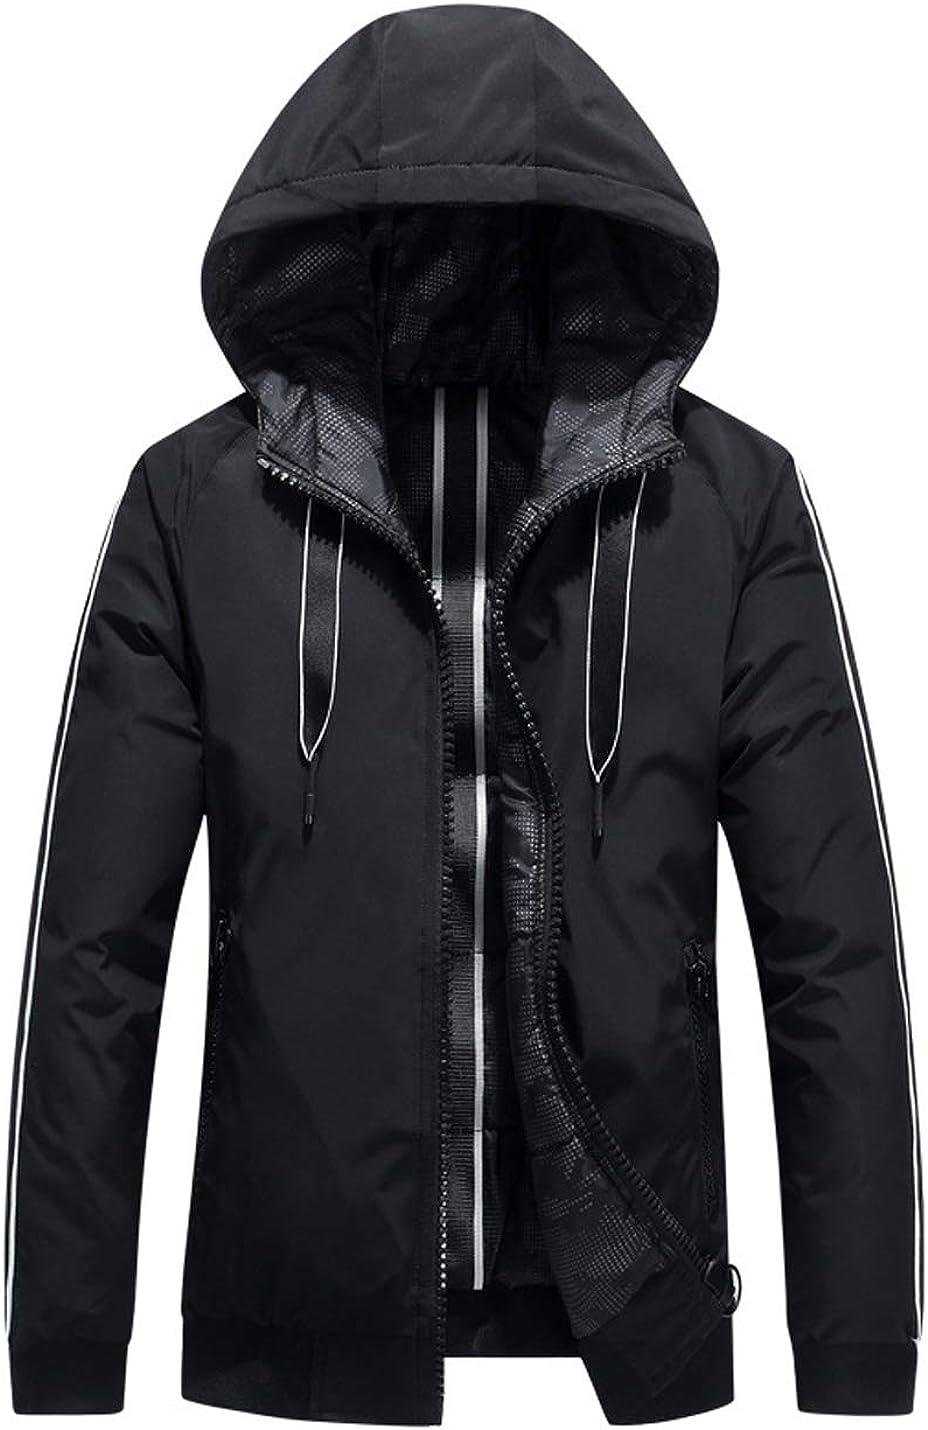 Hongsui Men's Winter Short Hooded Workwear Down Padded Jacket